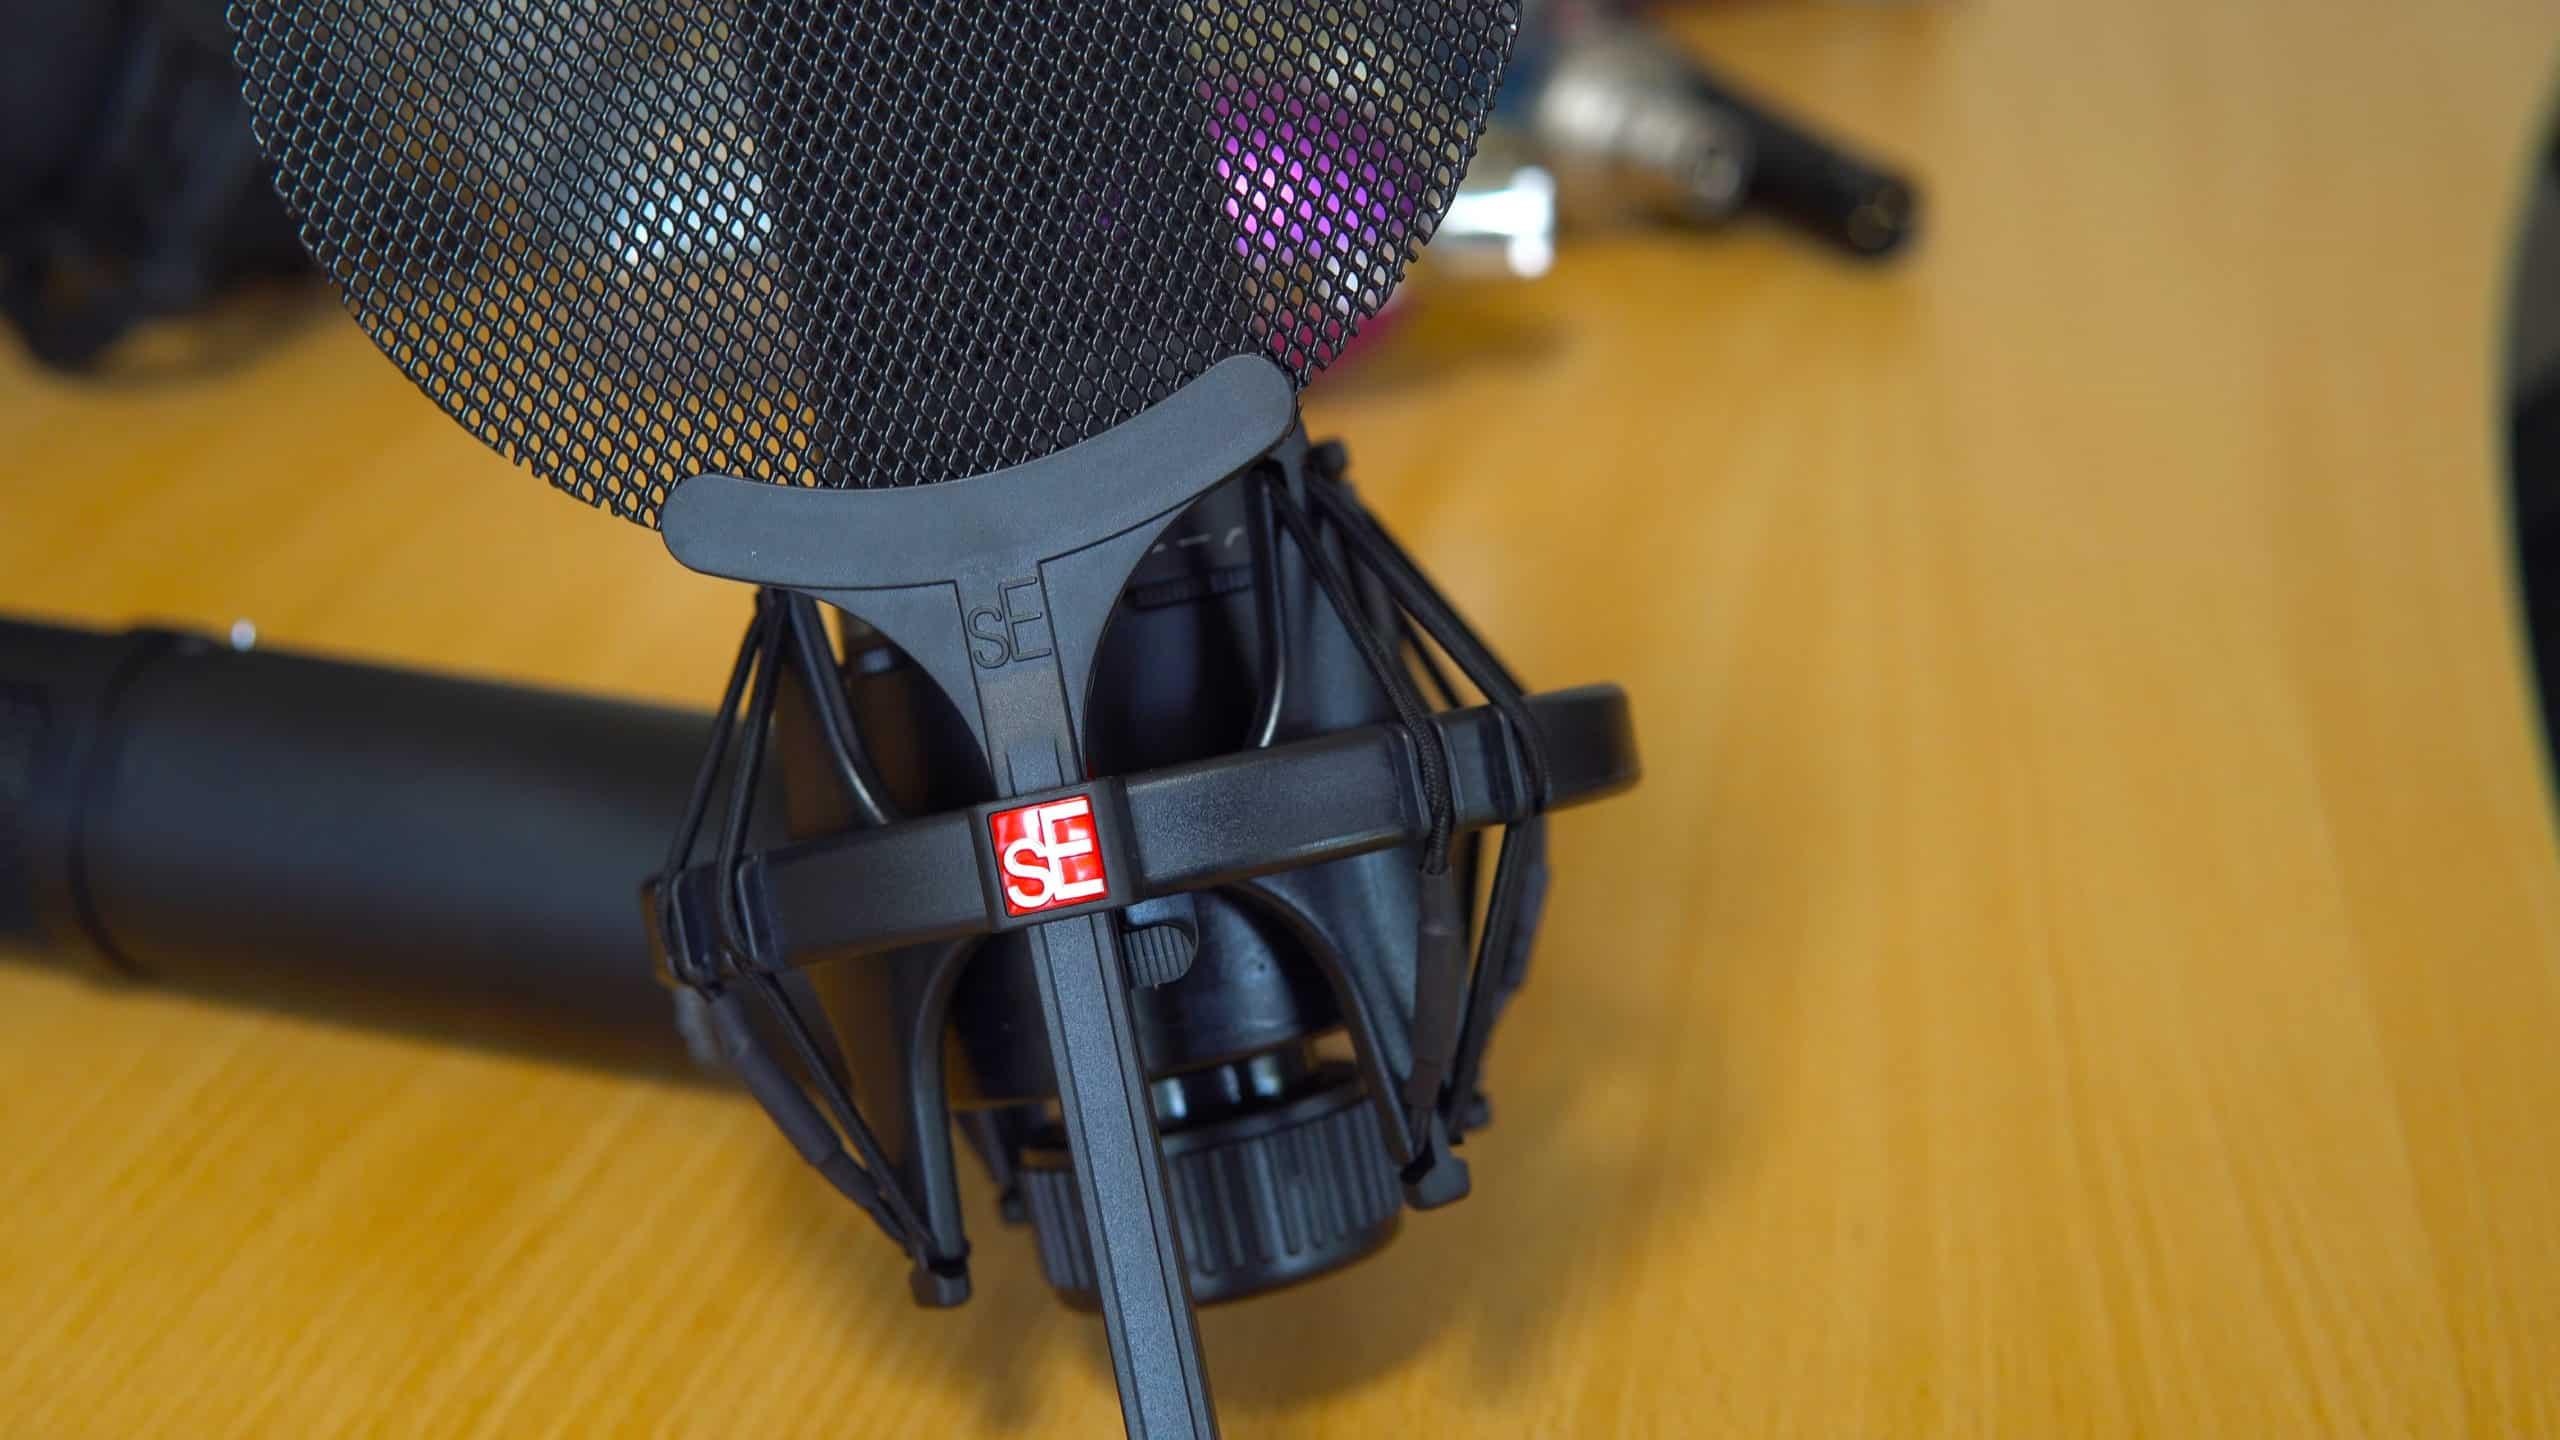 sE Electronics X1 Microphone